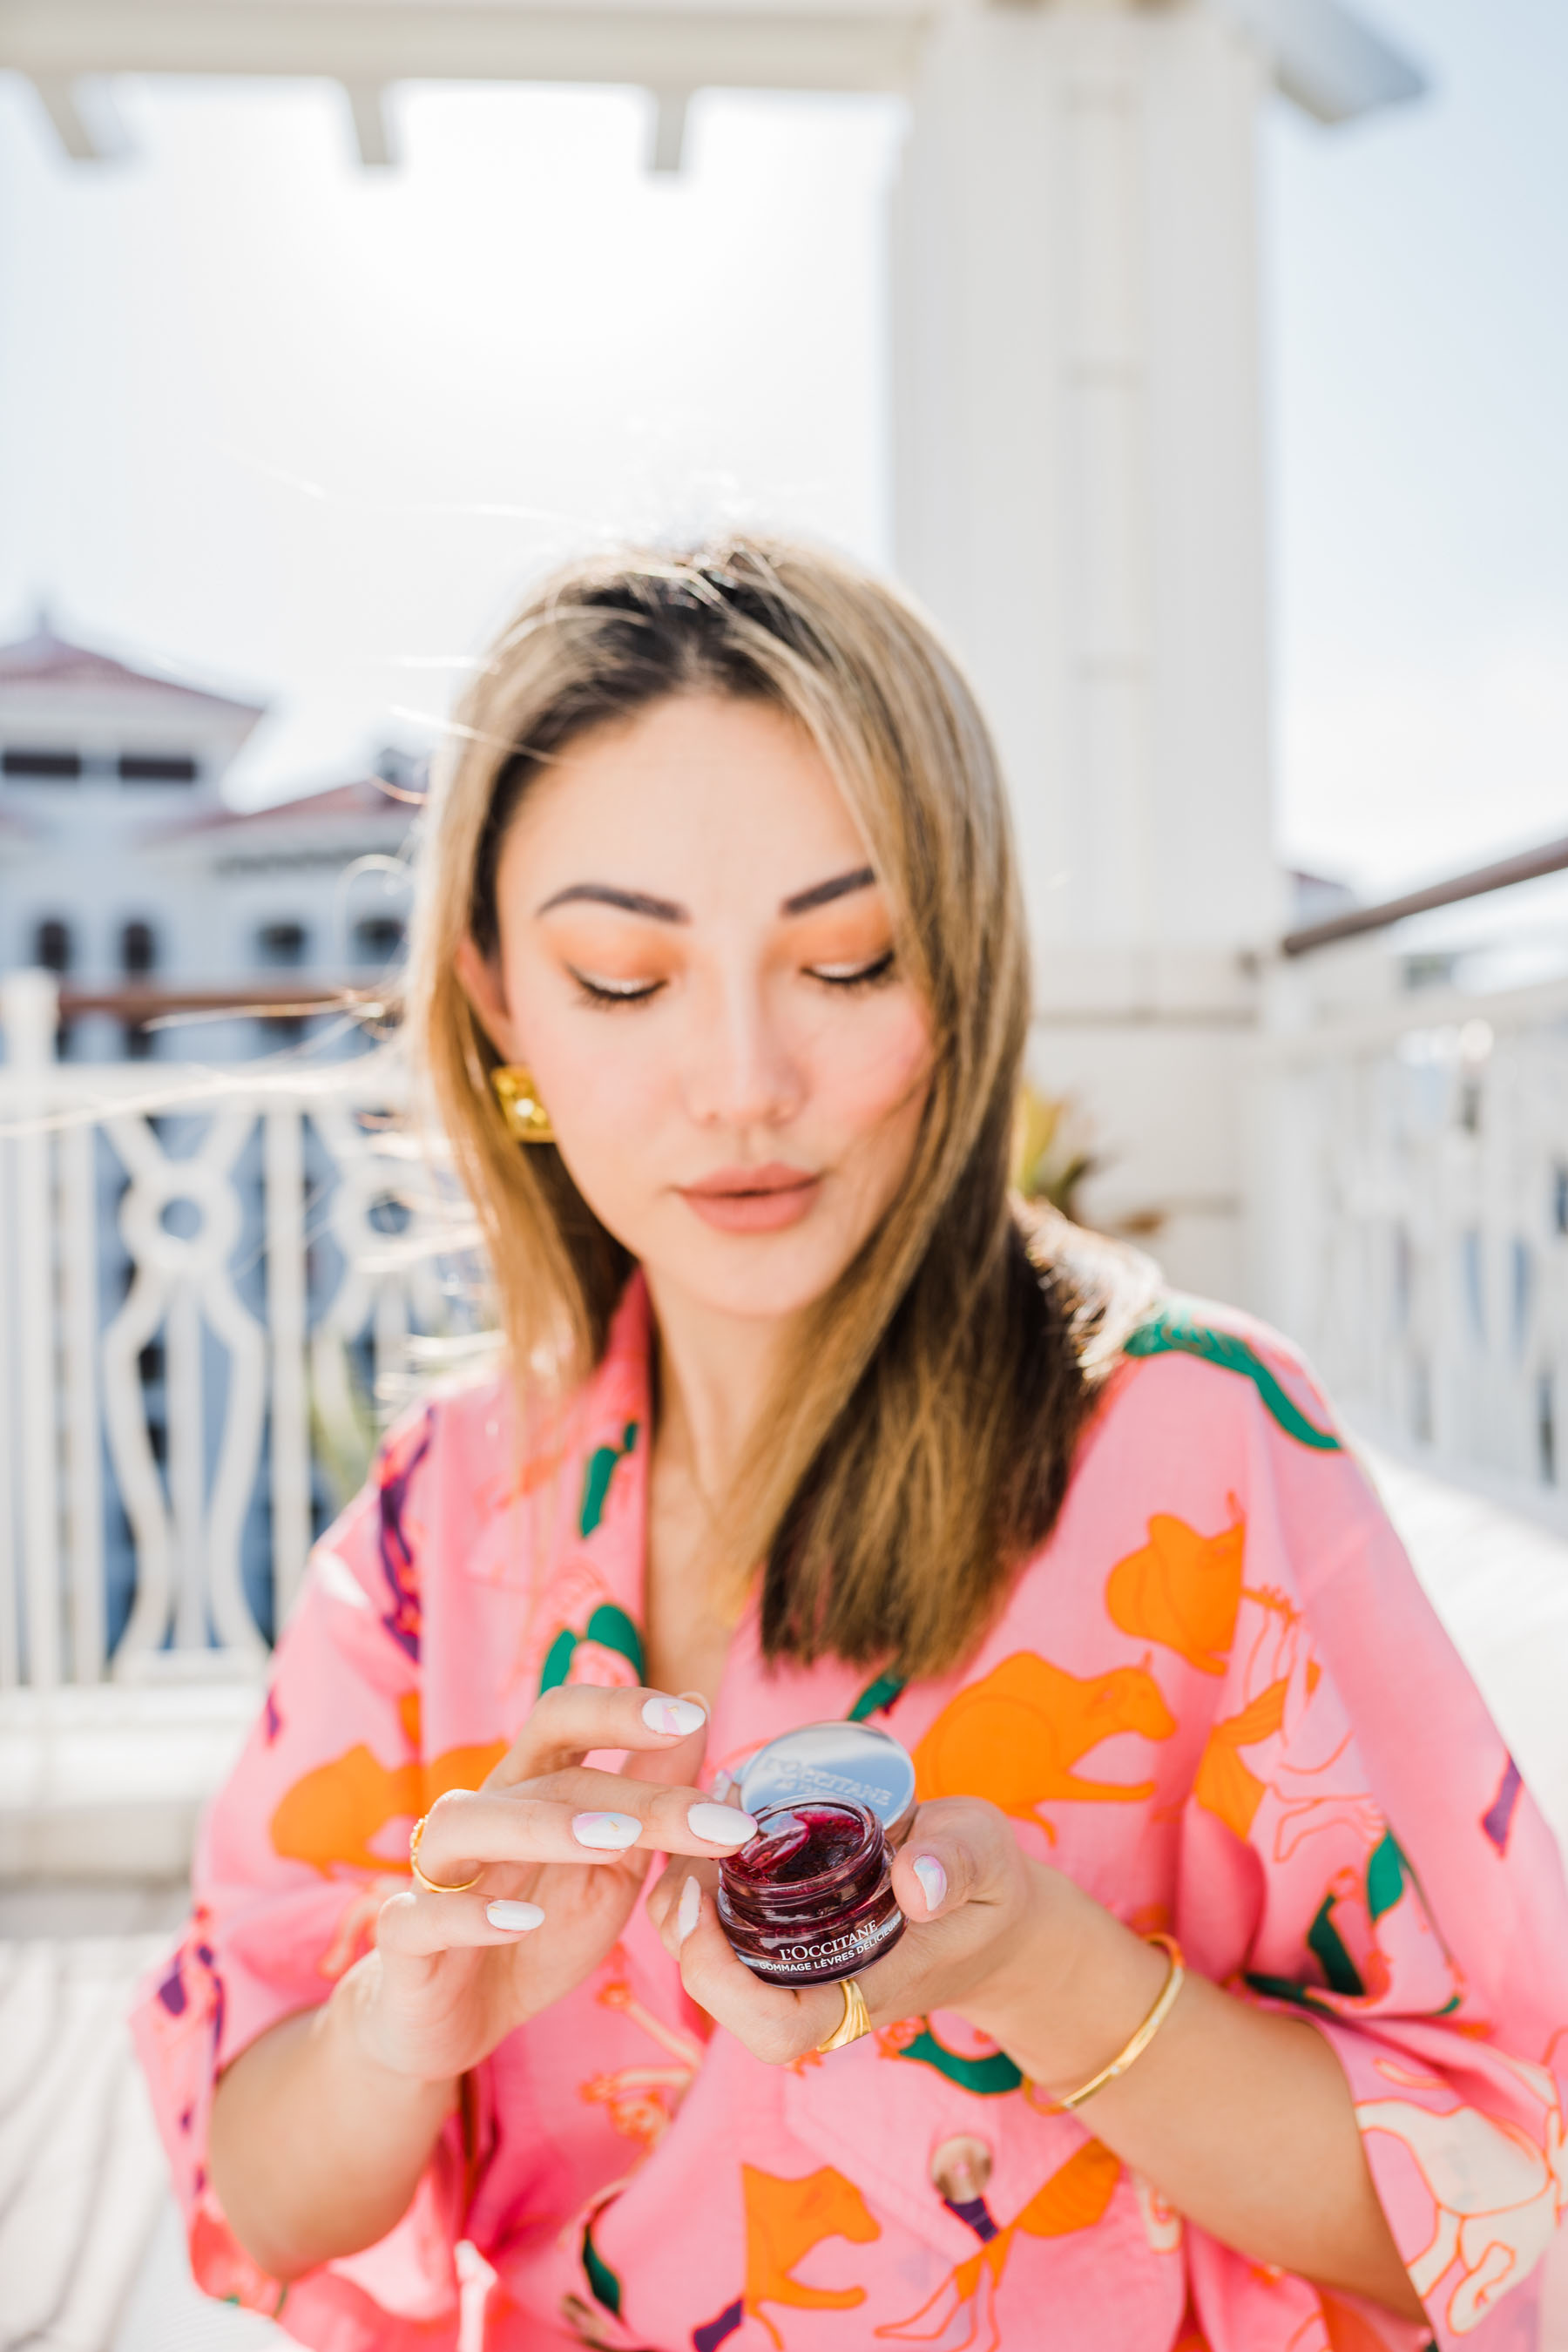 self-care products, l'occitane fruity lipstick, l'occitane lip products, tropical pjs // Notjessfashion.com